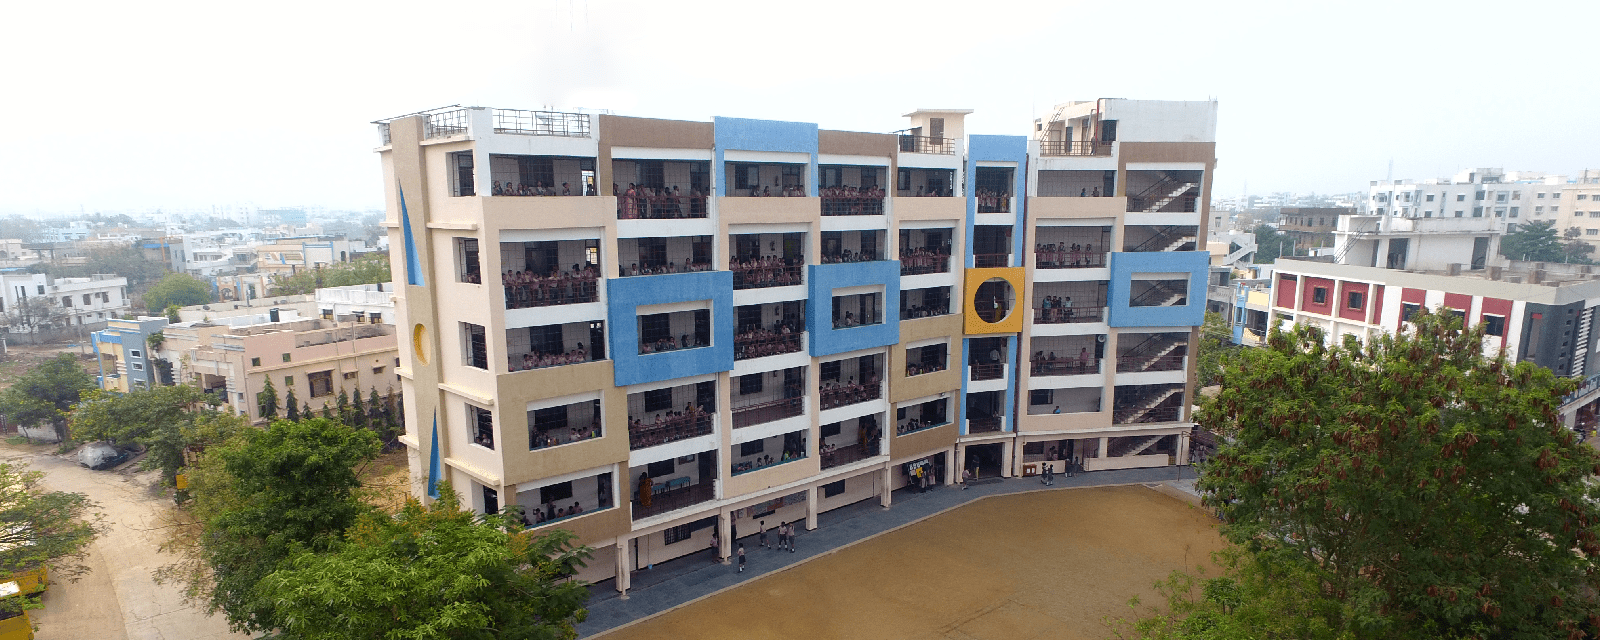 SPR School of Excellence